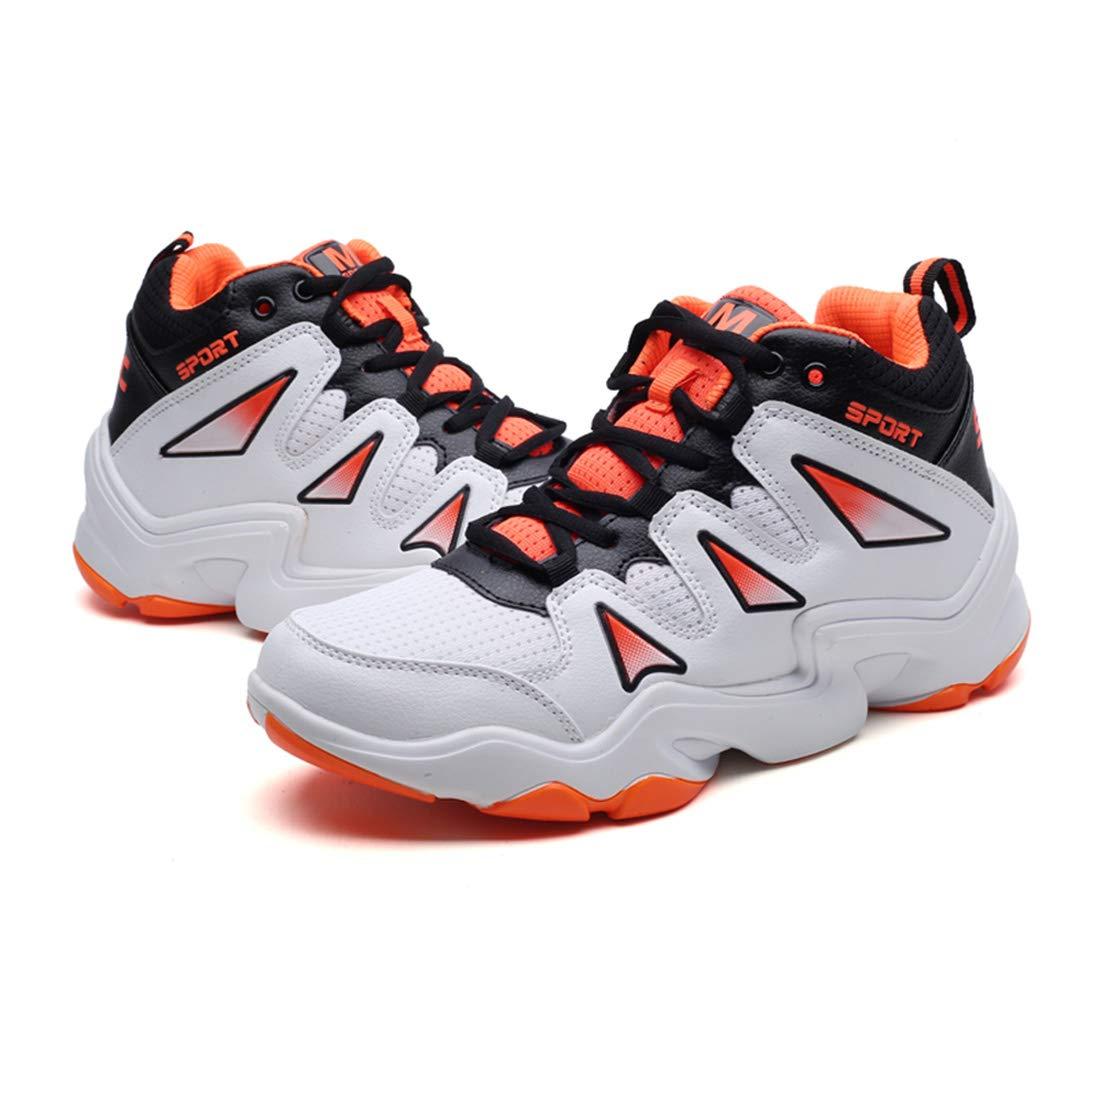 DANDANJIE Herren Basketball-Schuhe Basketball-Schuhe Basketball-Schuhe Fashion Turnschuhe Paar Outdoor-Lauftrainer Schuhe 6e4638